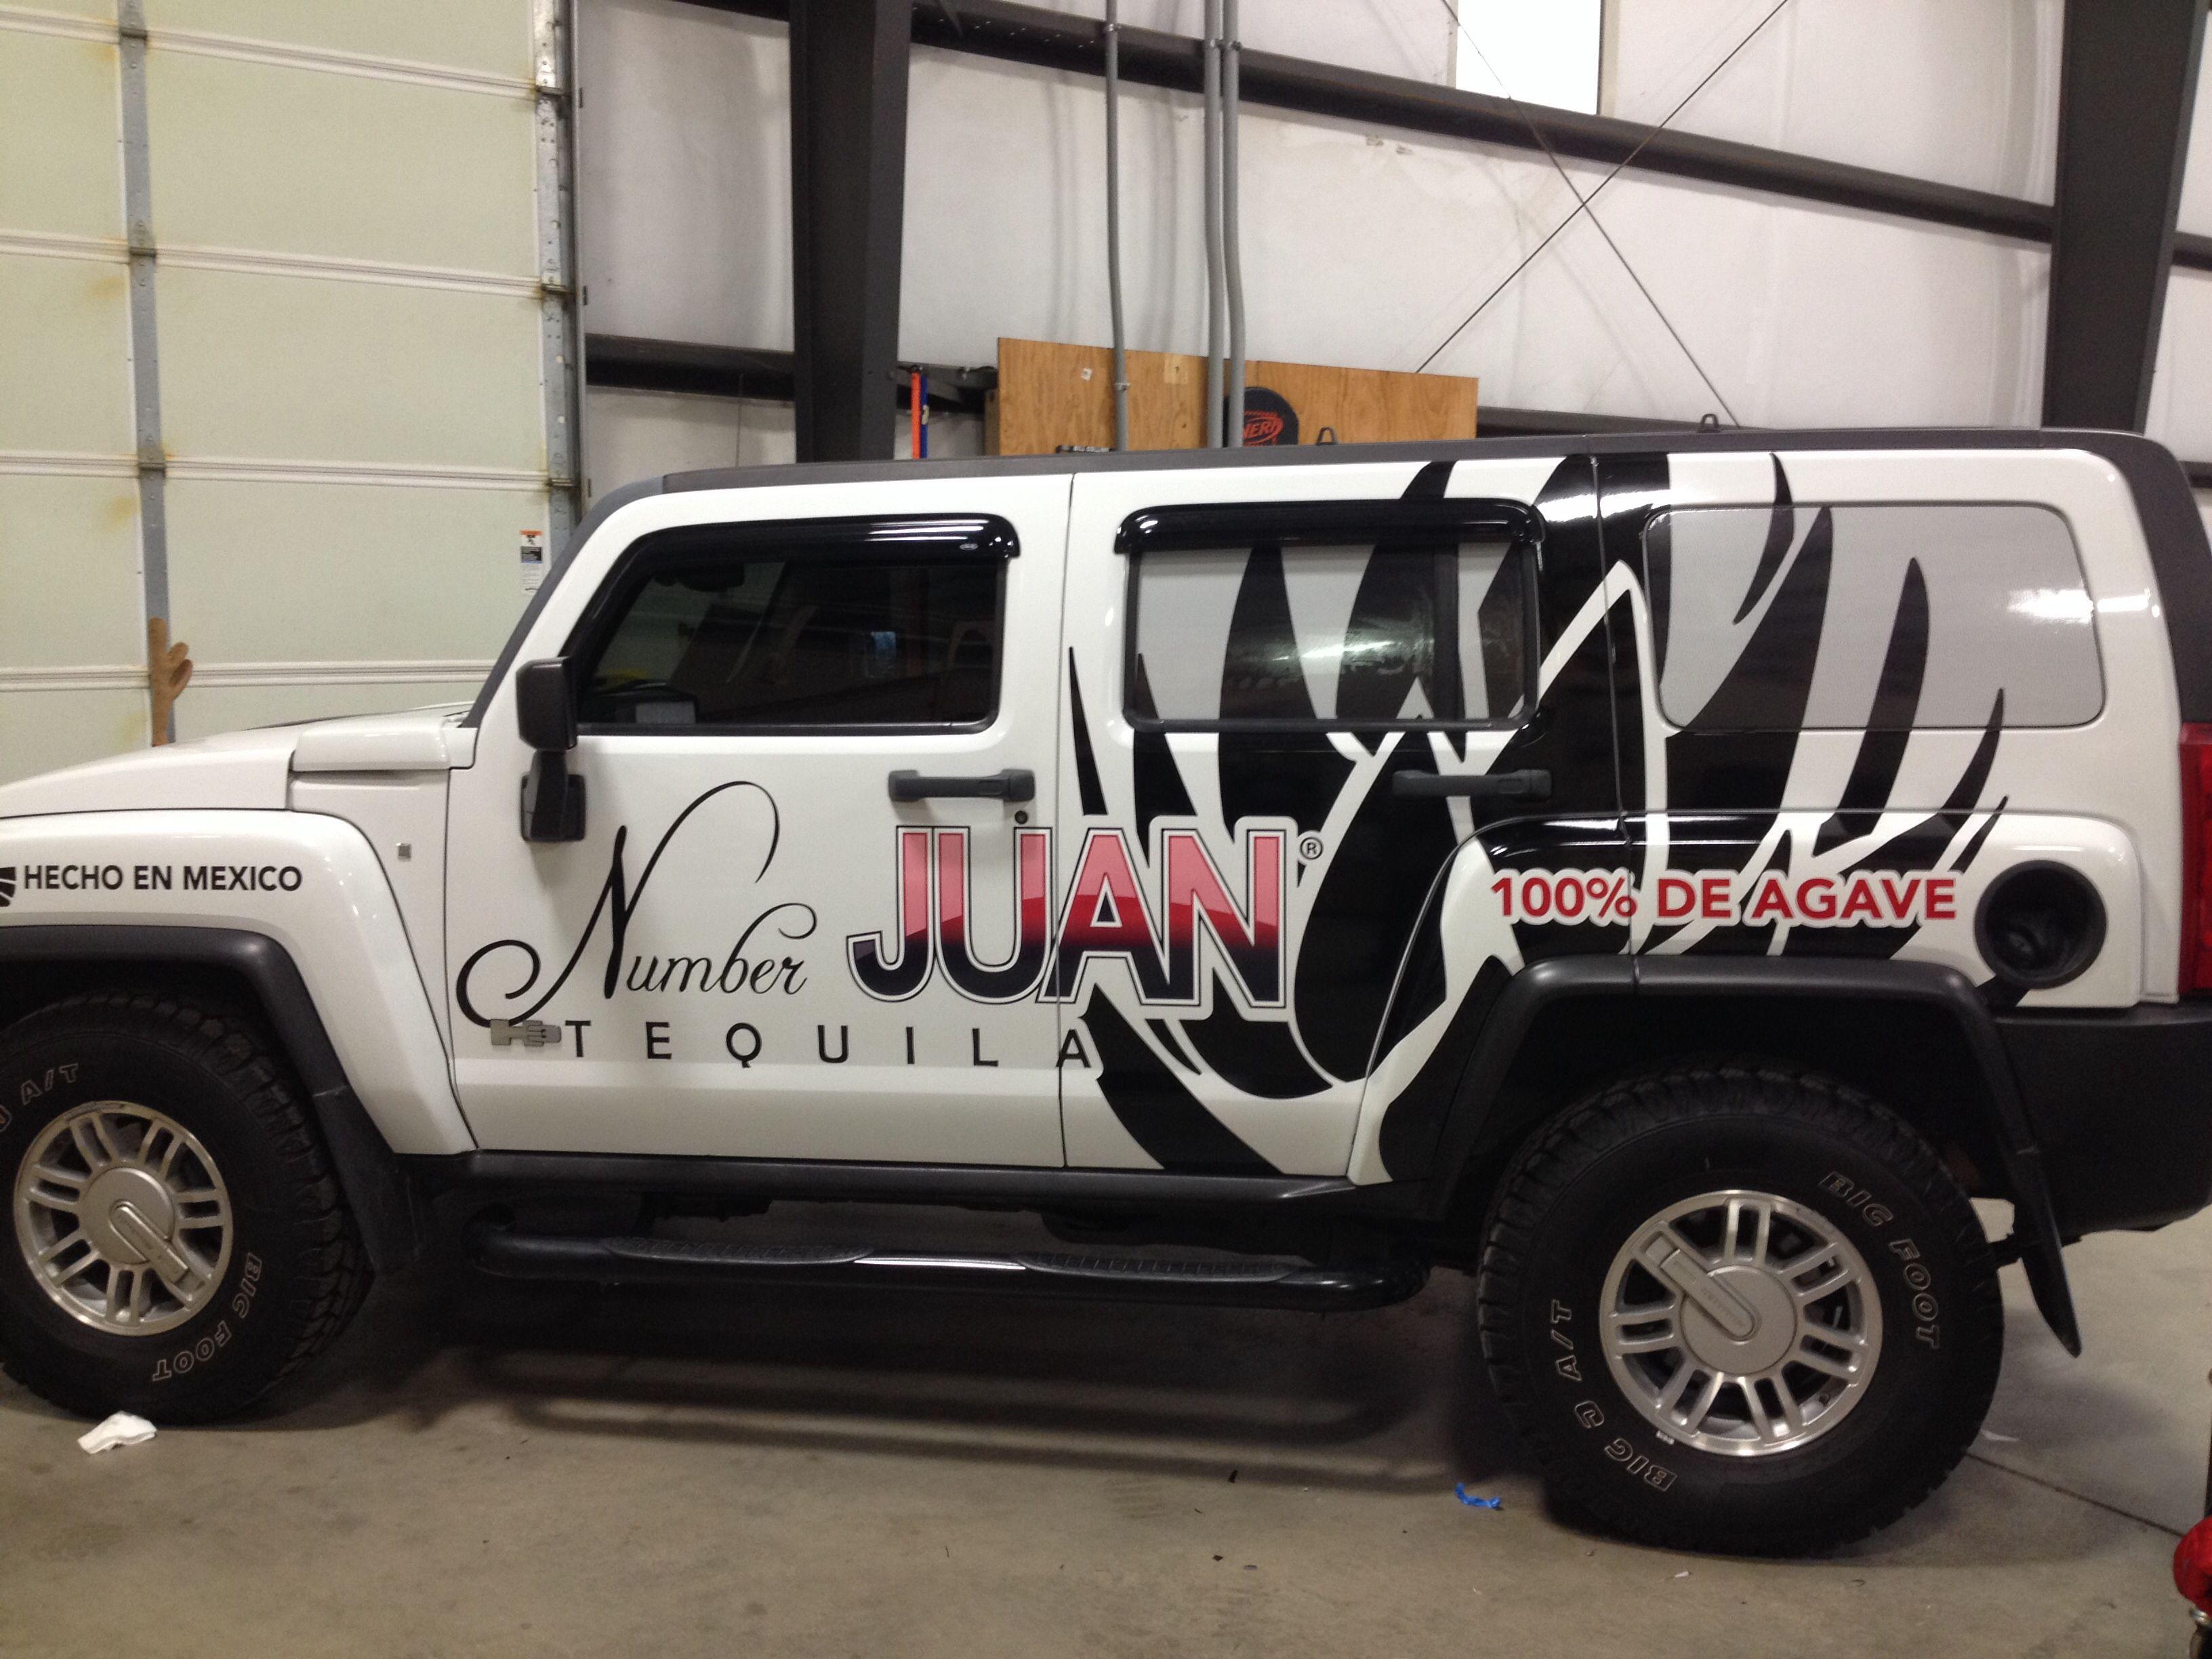 Number Juan tequila H2 hummer Vehicle Wraps Pinterest